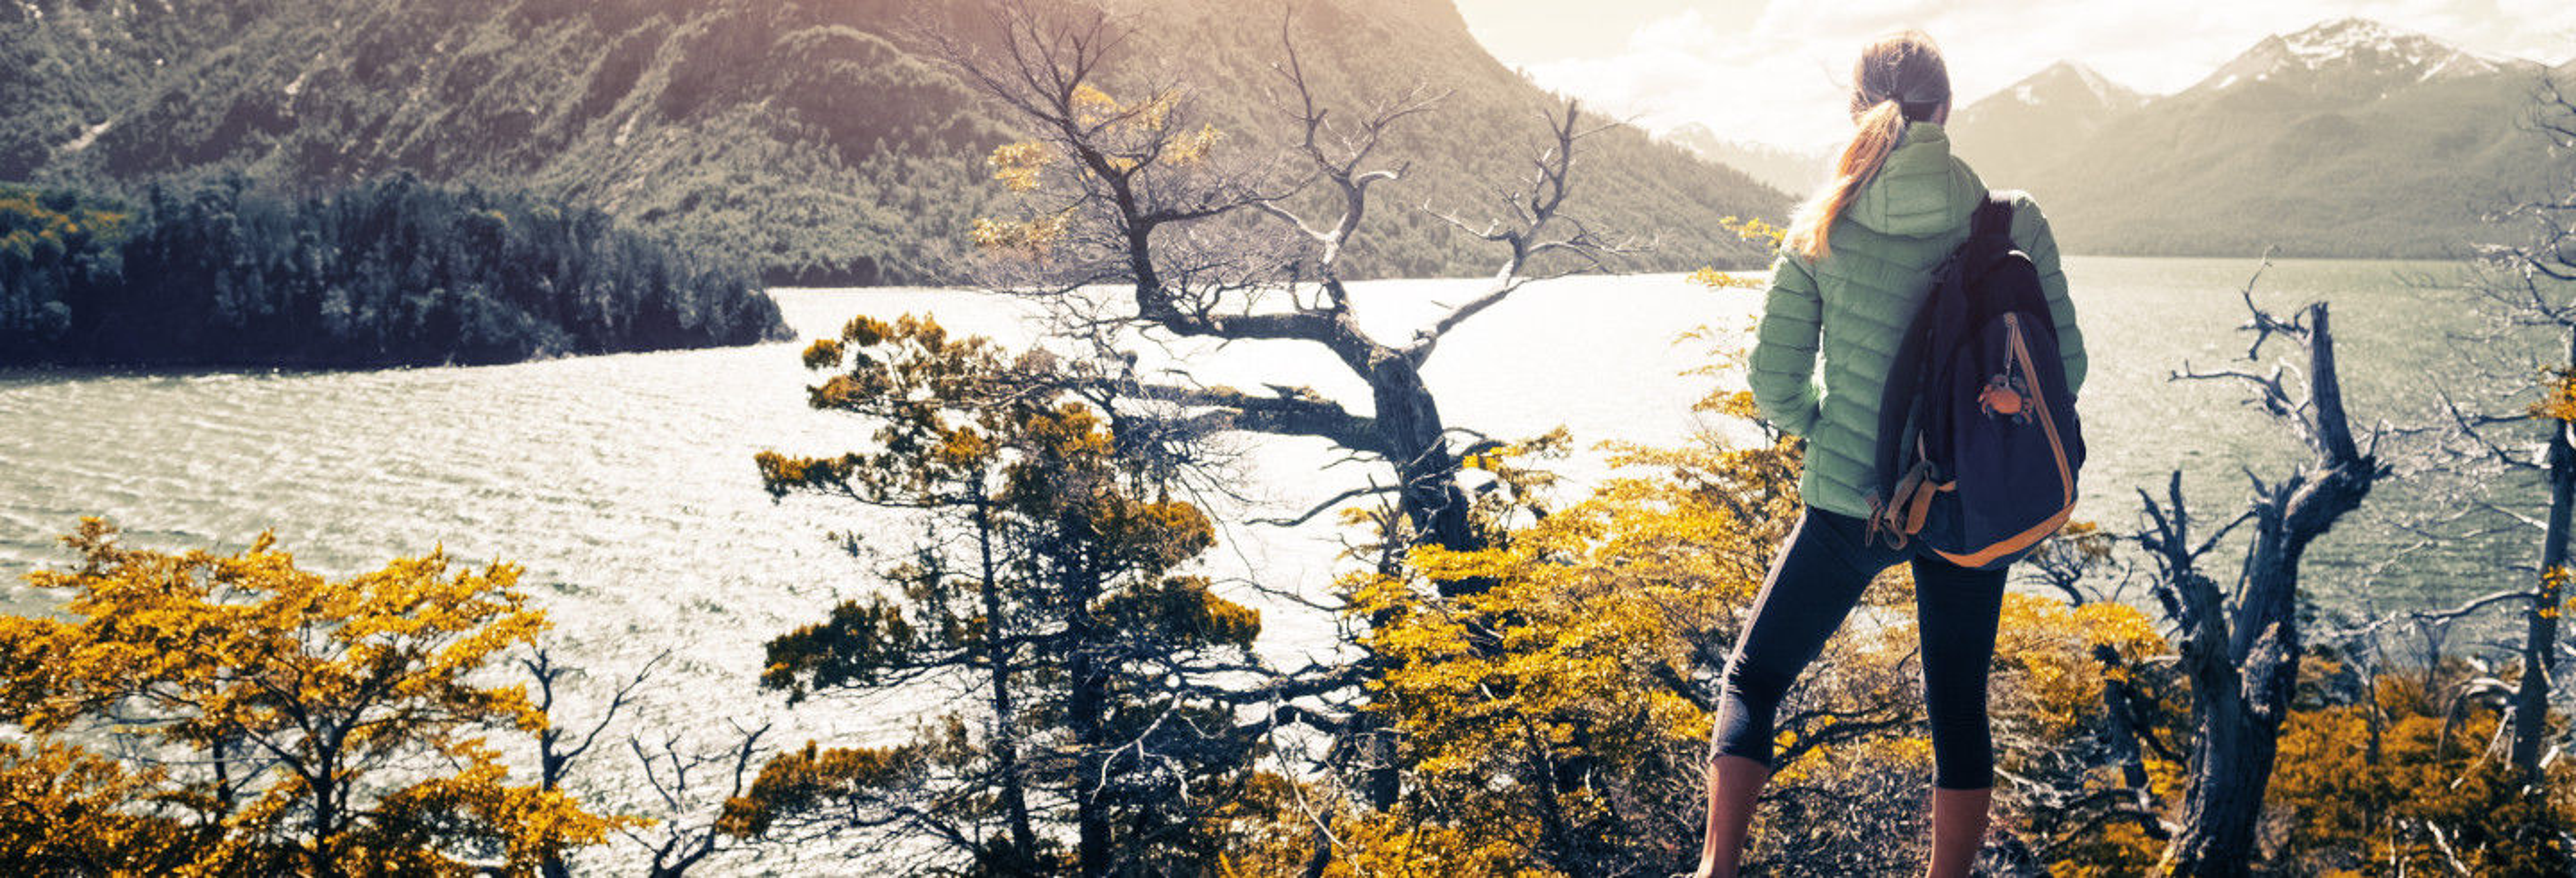 Trekking & 4x4 Ride at Cerro Challhuaco